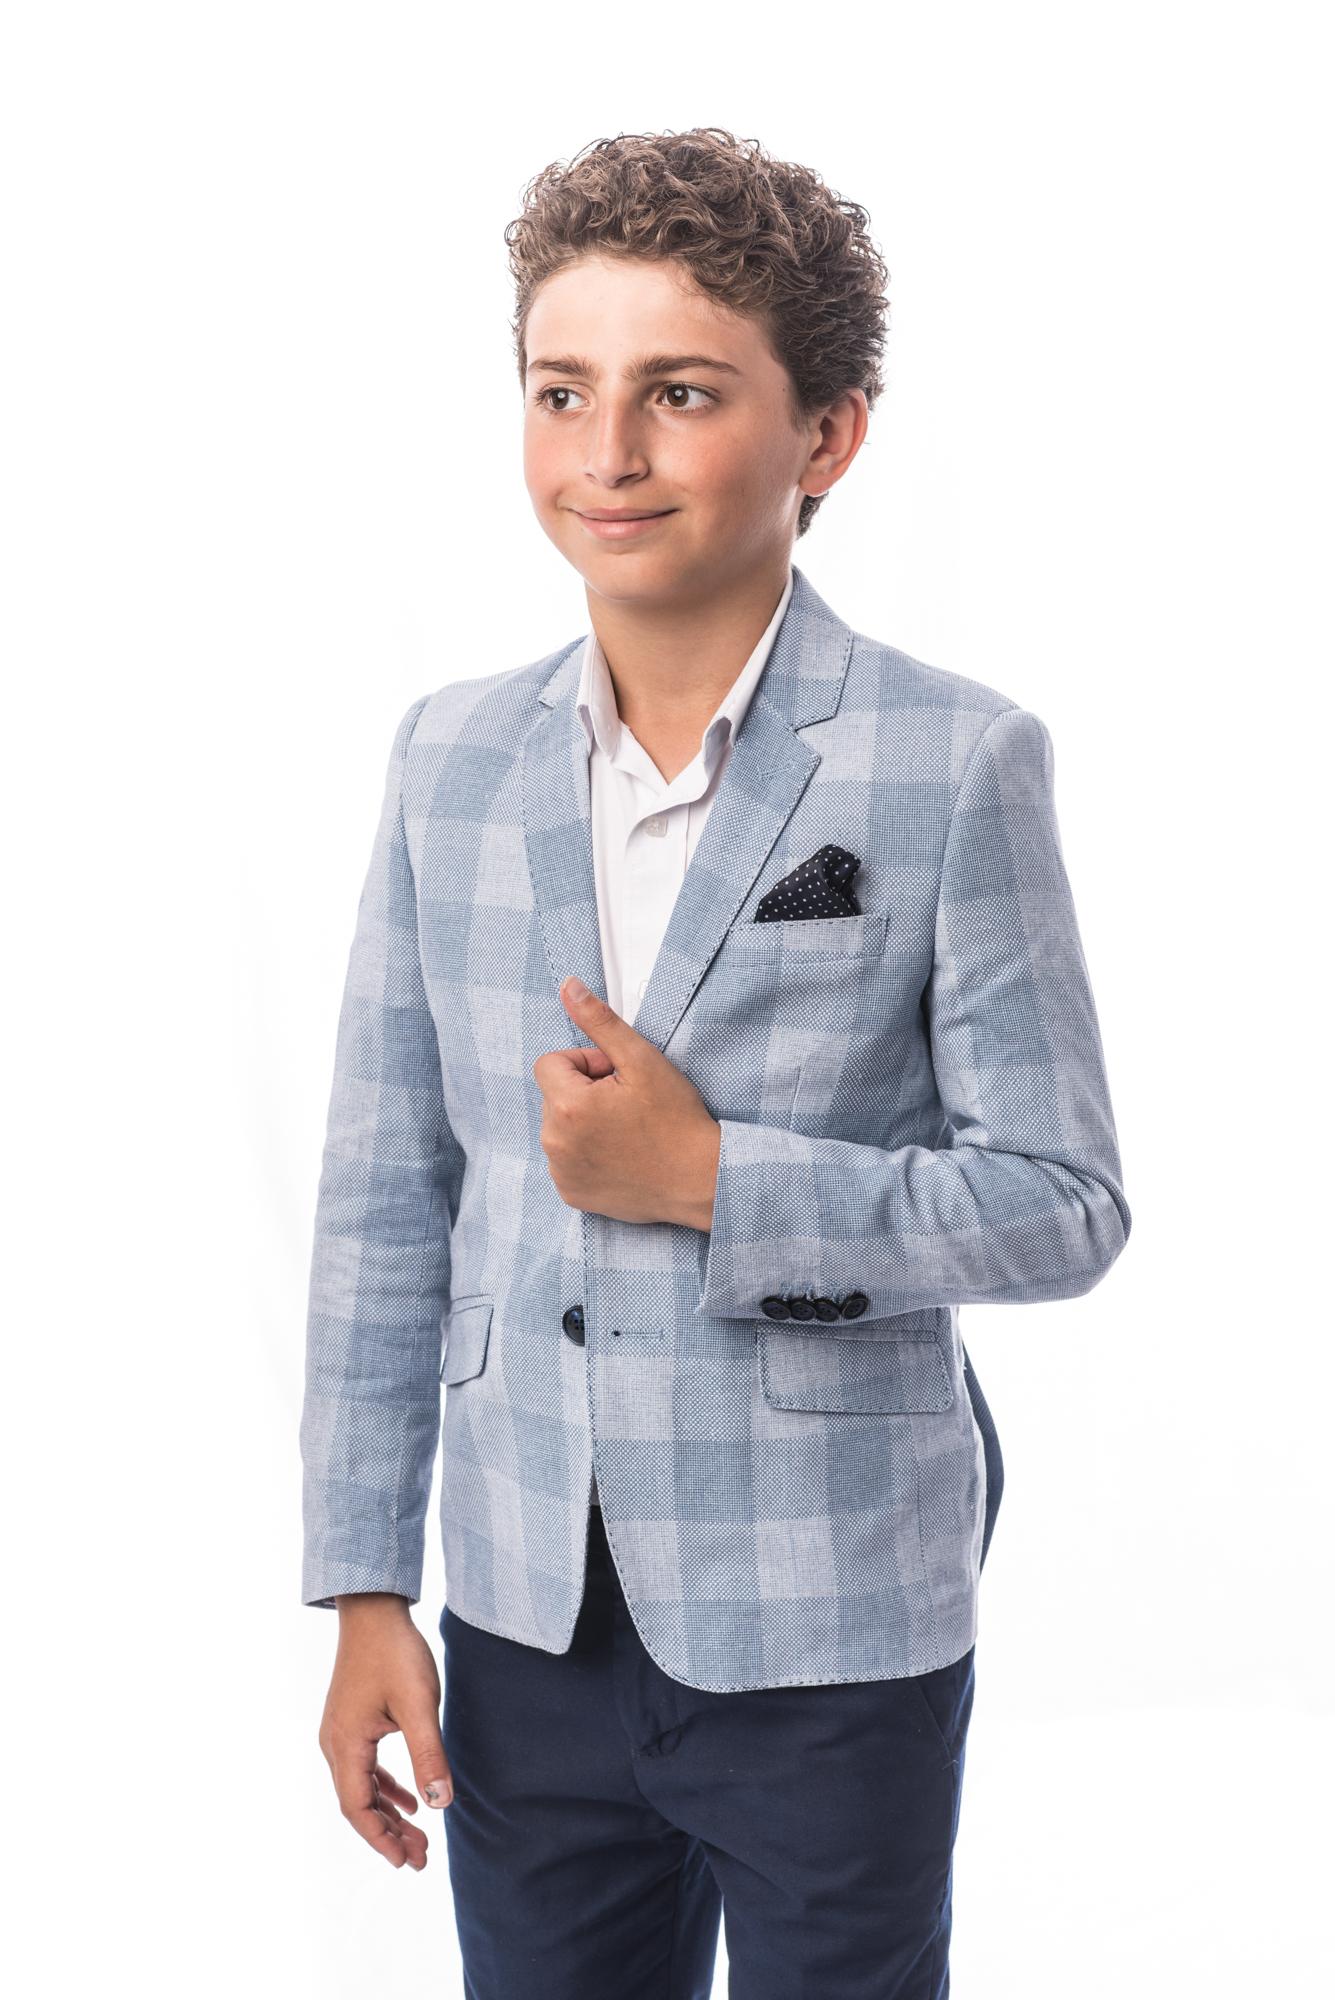 Big Checkerboard Boys Blazers / Sports Coat Jacket EBBS1708B